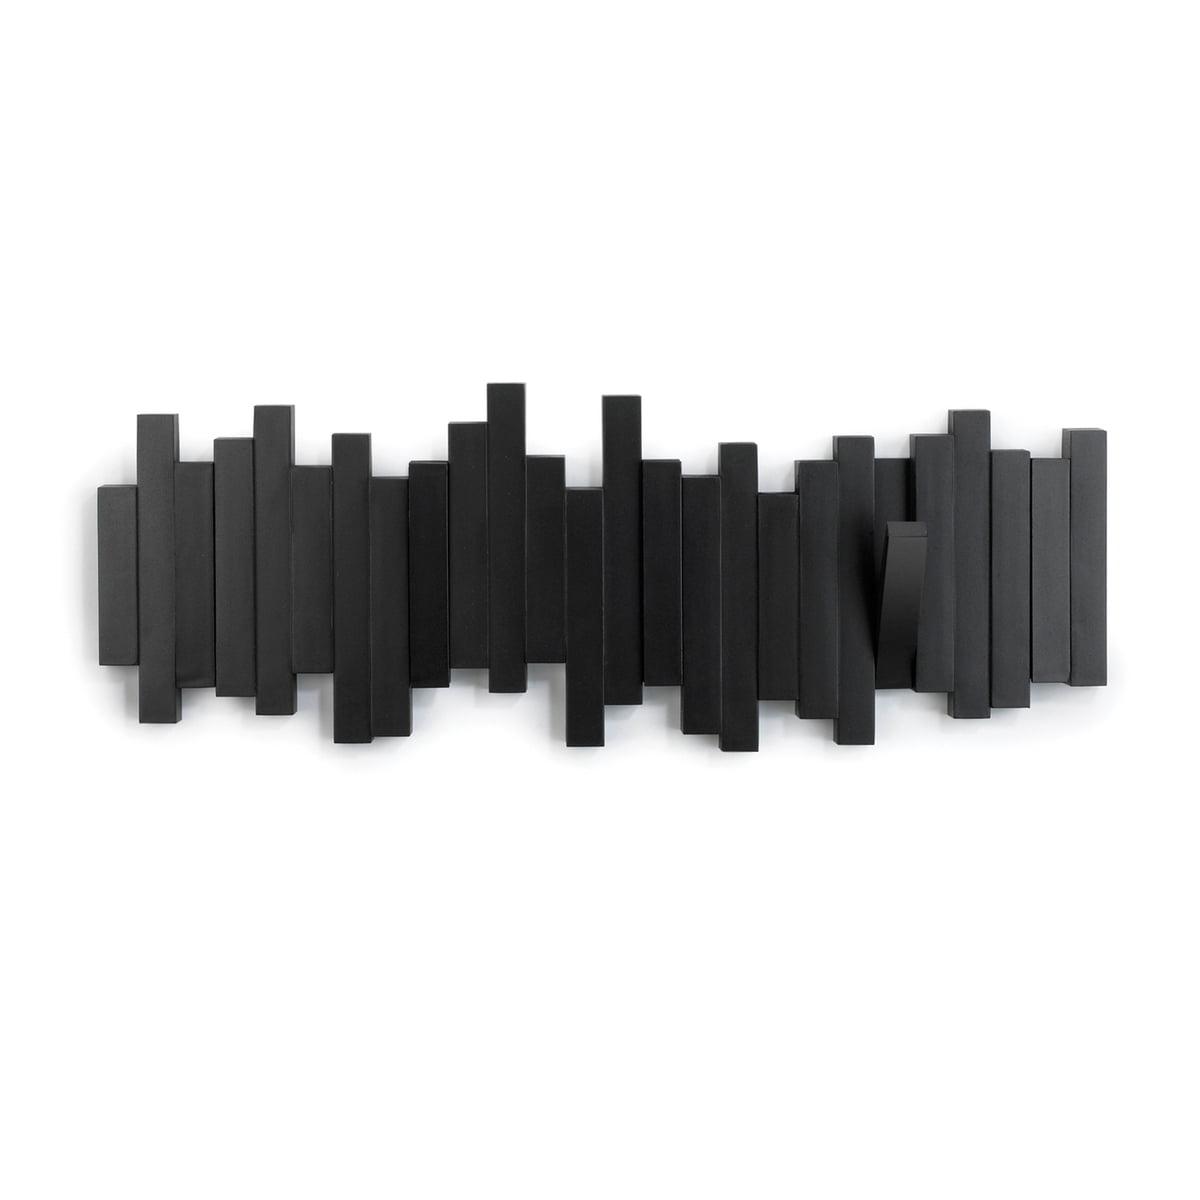 Umbra - Sticks Wandgarderobe, schwarz | Flur & Diele > Garderoben > Garderobenhaken | Schwarz | Kunststoff | Umbra